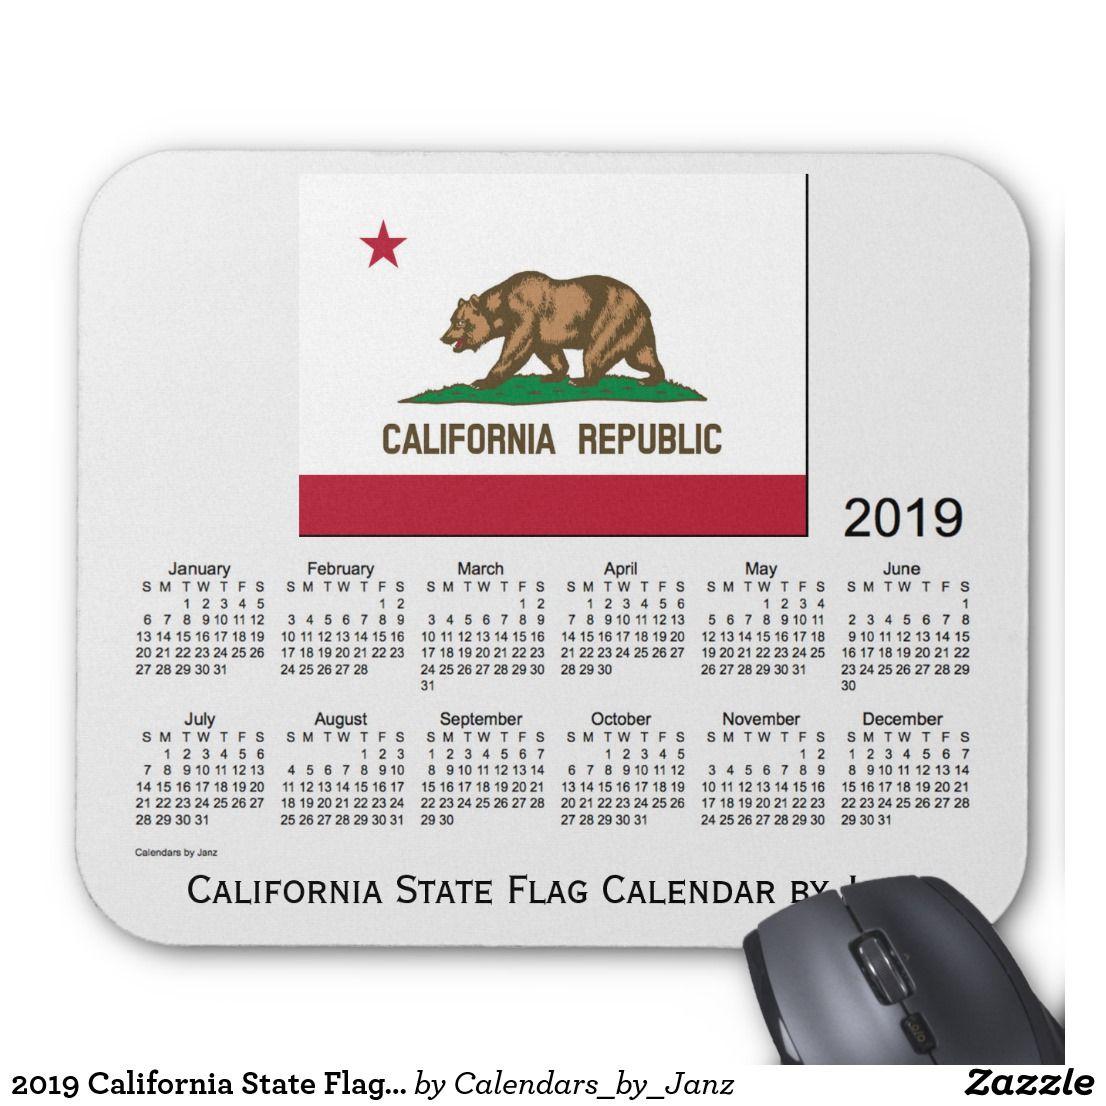 State Of California Calendar 2019 2019 California State Flag Calendar by Janz Mouse Pad | Zazzle.